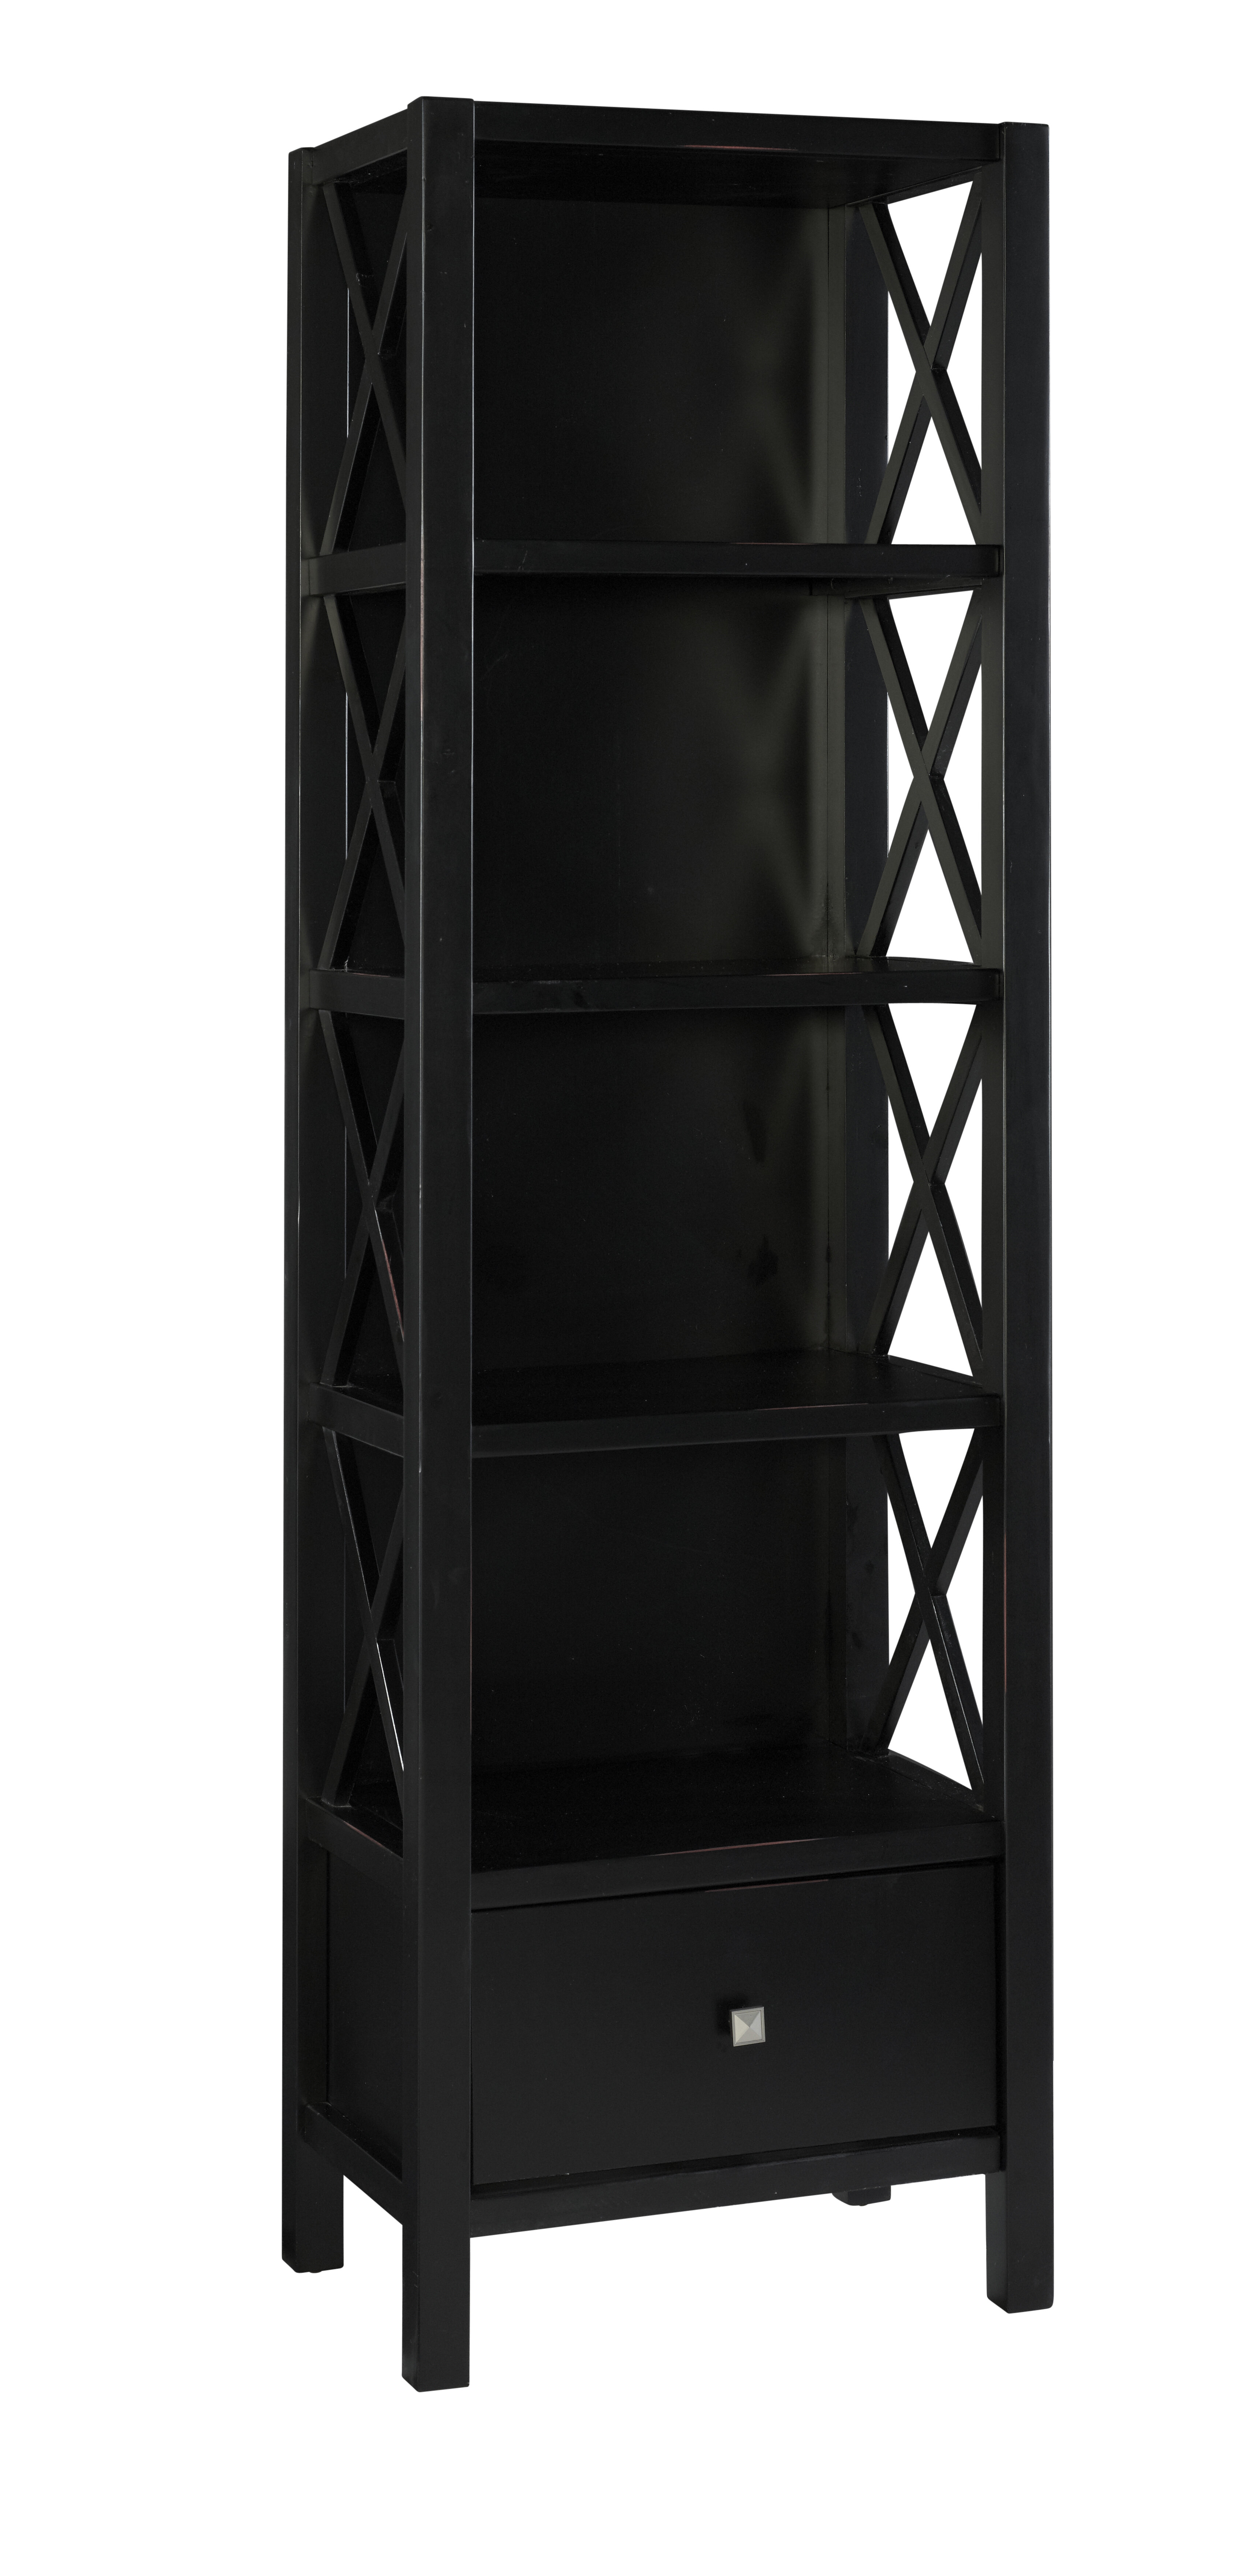 Fairlane Narrow Standard Bookcase